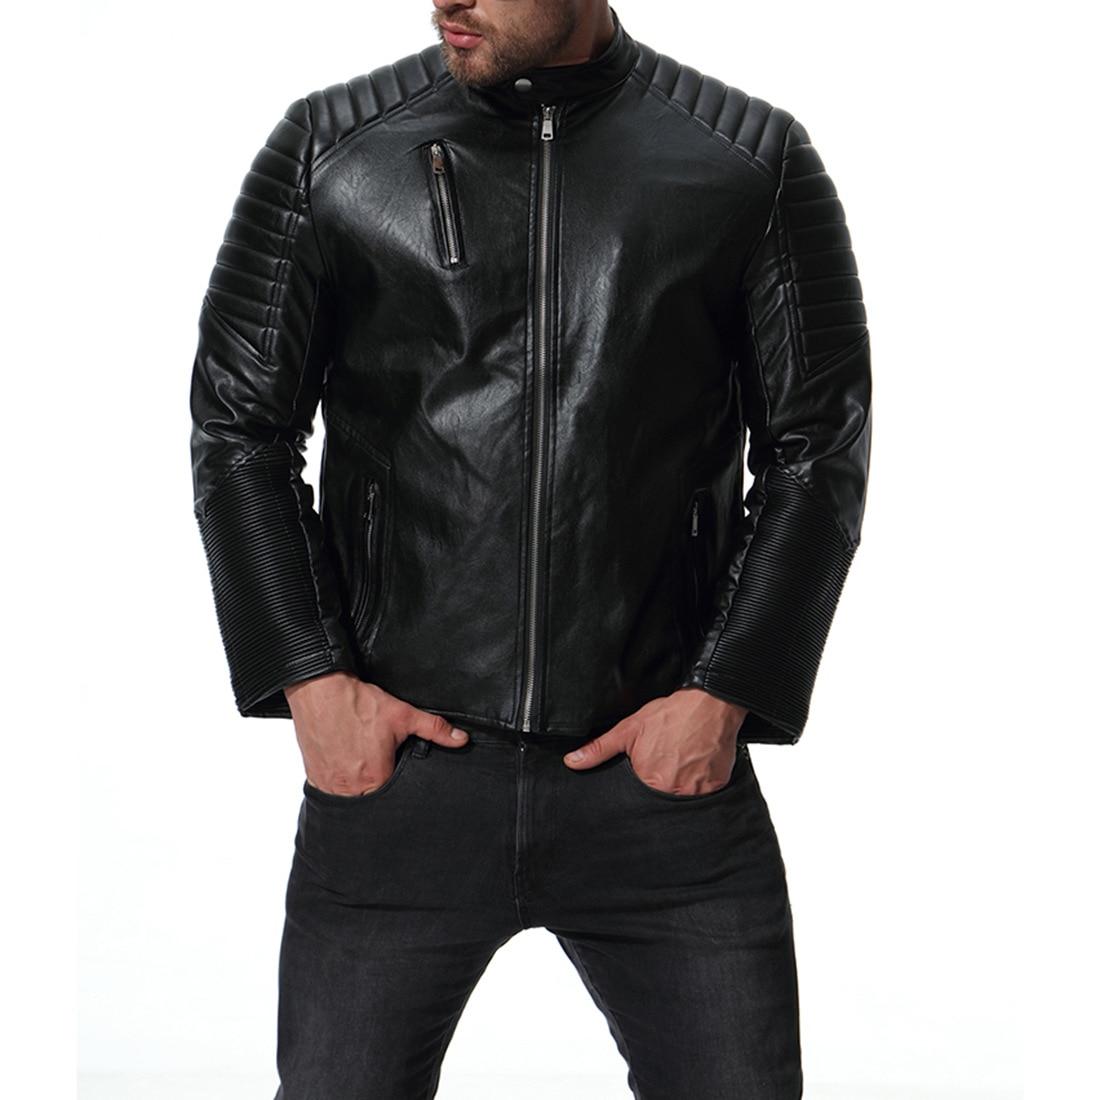 Cuero Multi Hombres Marca Cremallera S Hombre xxl Masculinas 2018 Jaqueta Motocicleta Negro Chaqueta AntqYx88